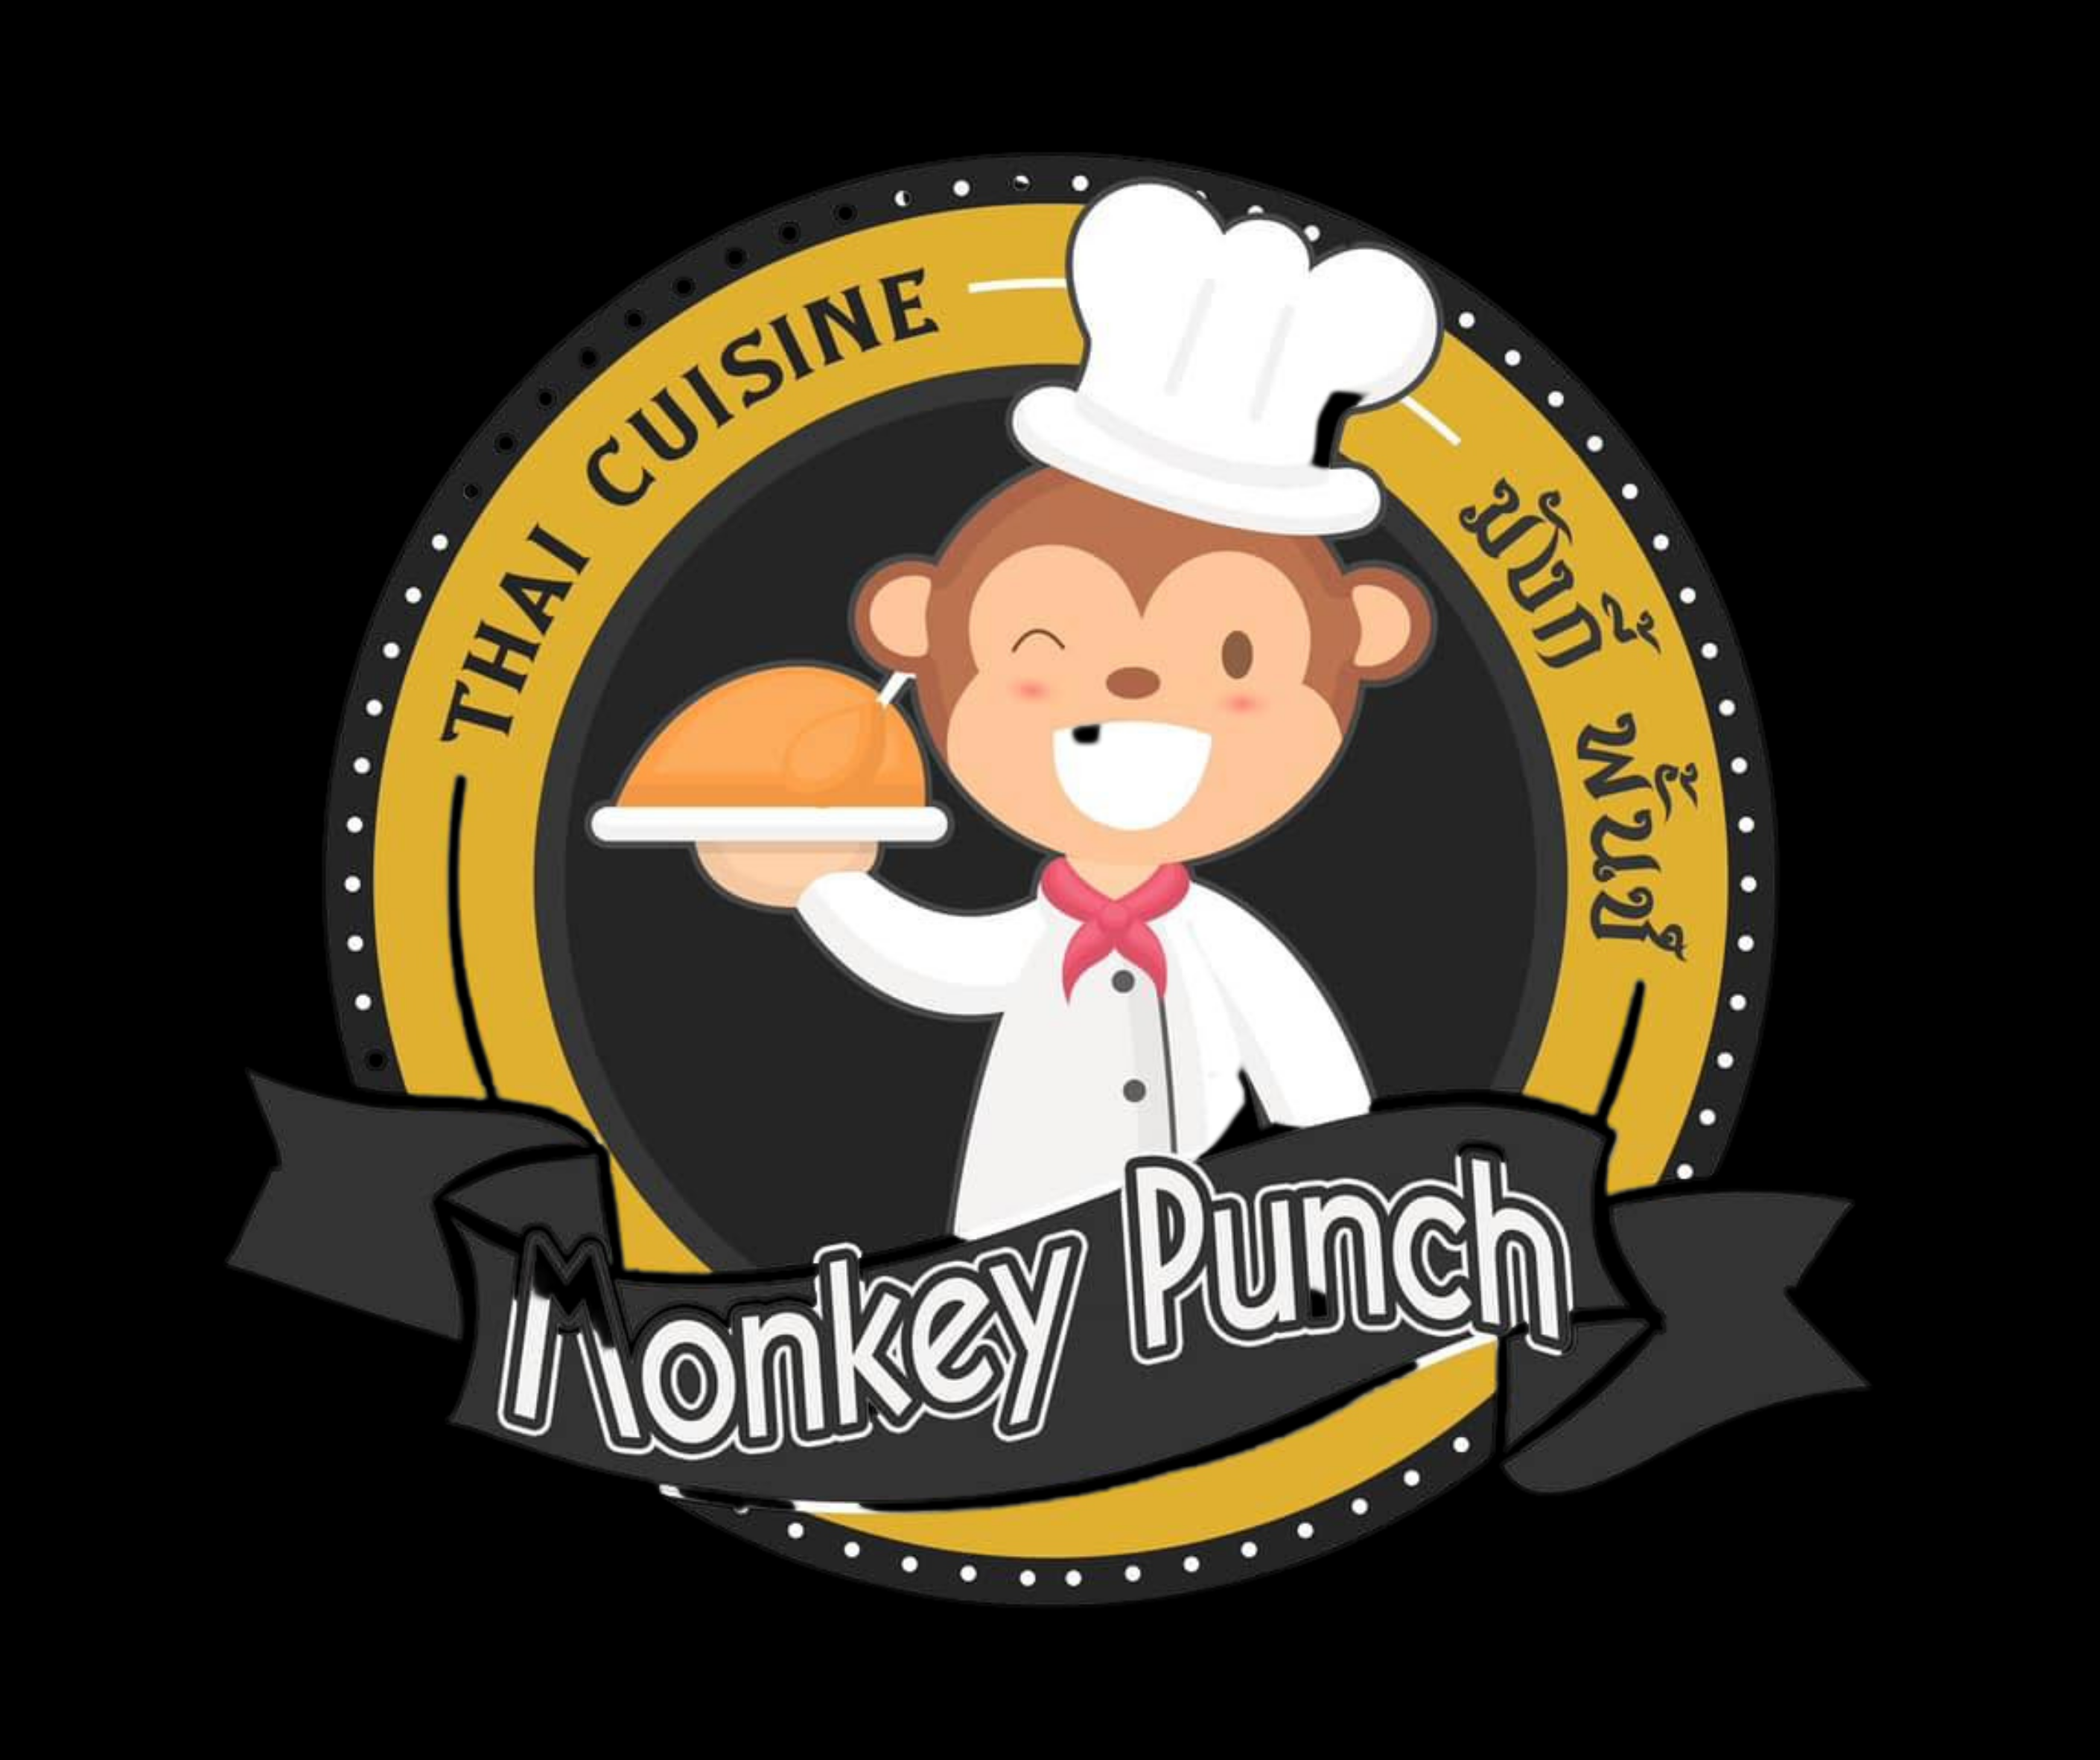 Monkey Punch Thai Cuisine